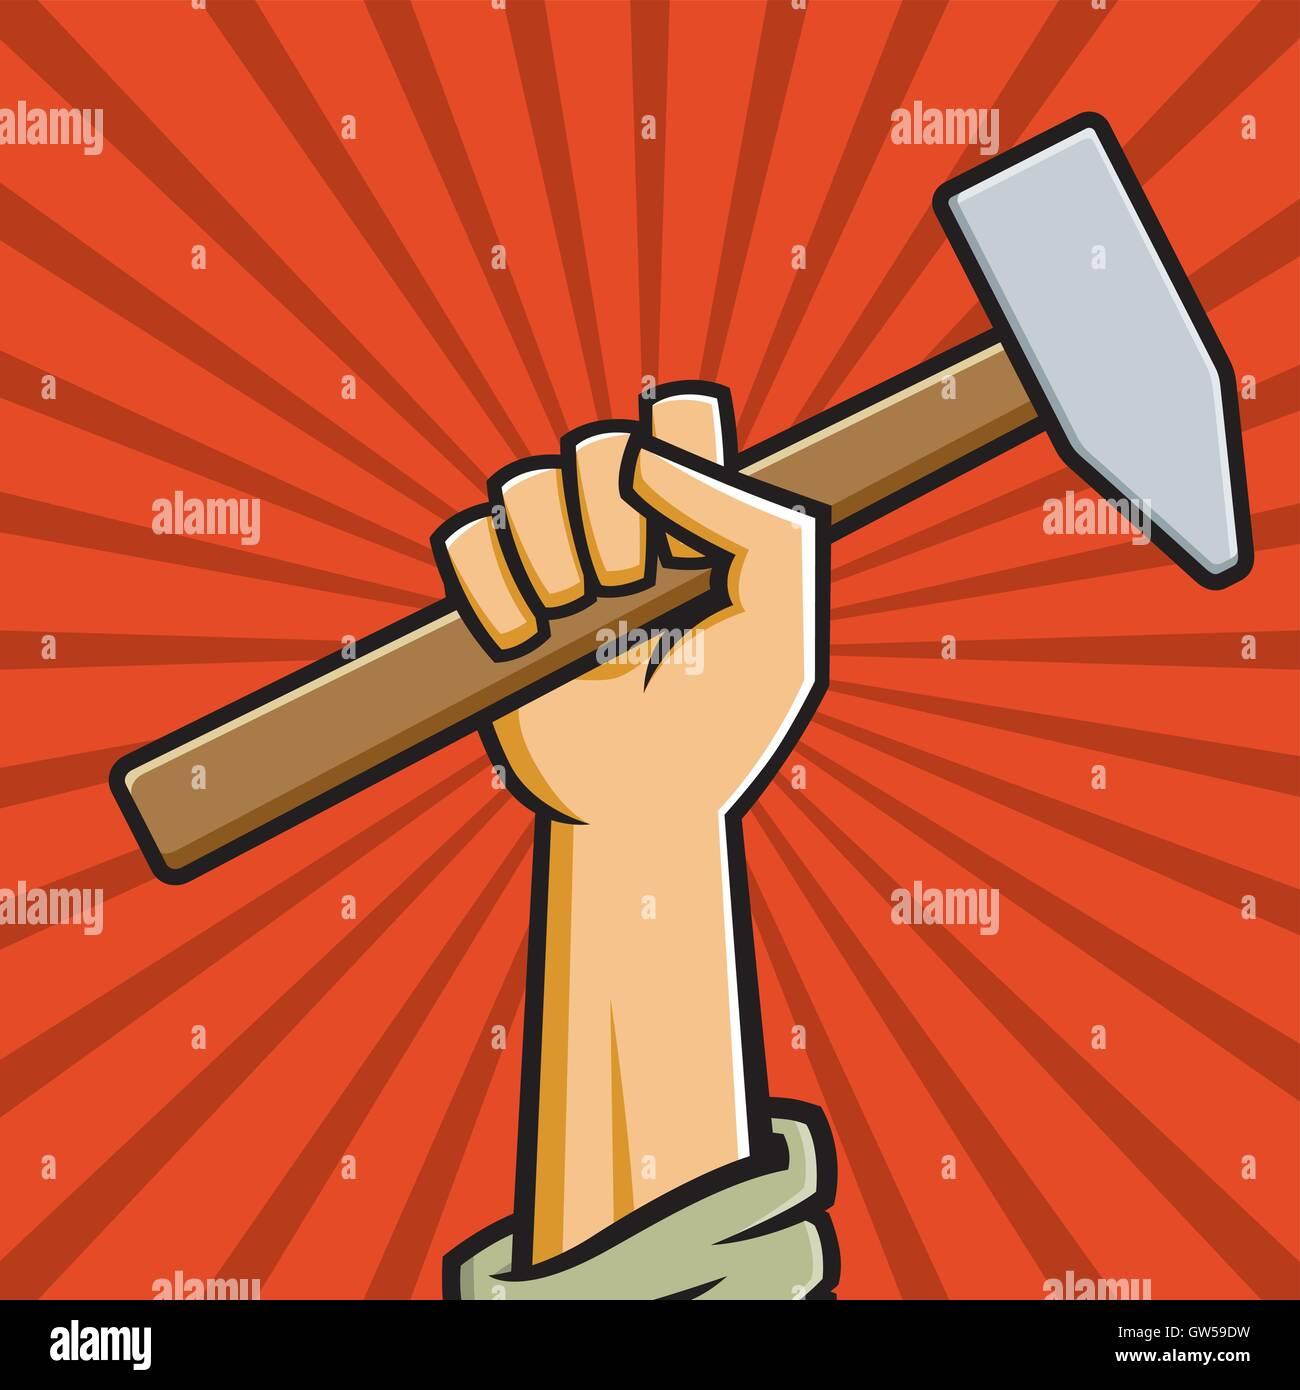 Raised Soviet fist holding a hammer. Vector illustration in the style of Russian Constructivist propaganda posters. - Stock Vector